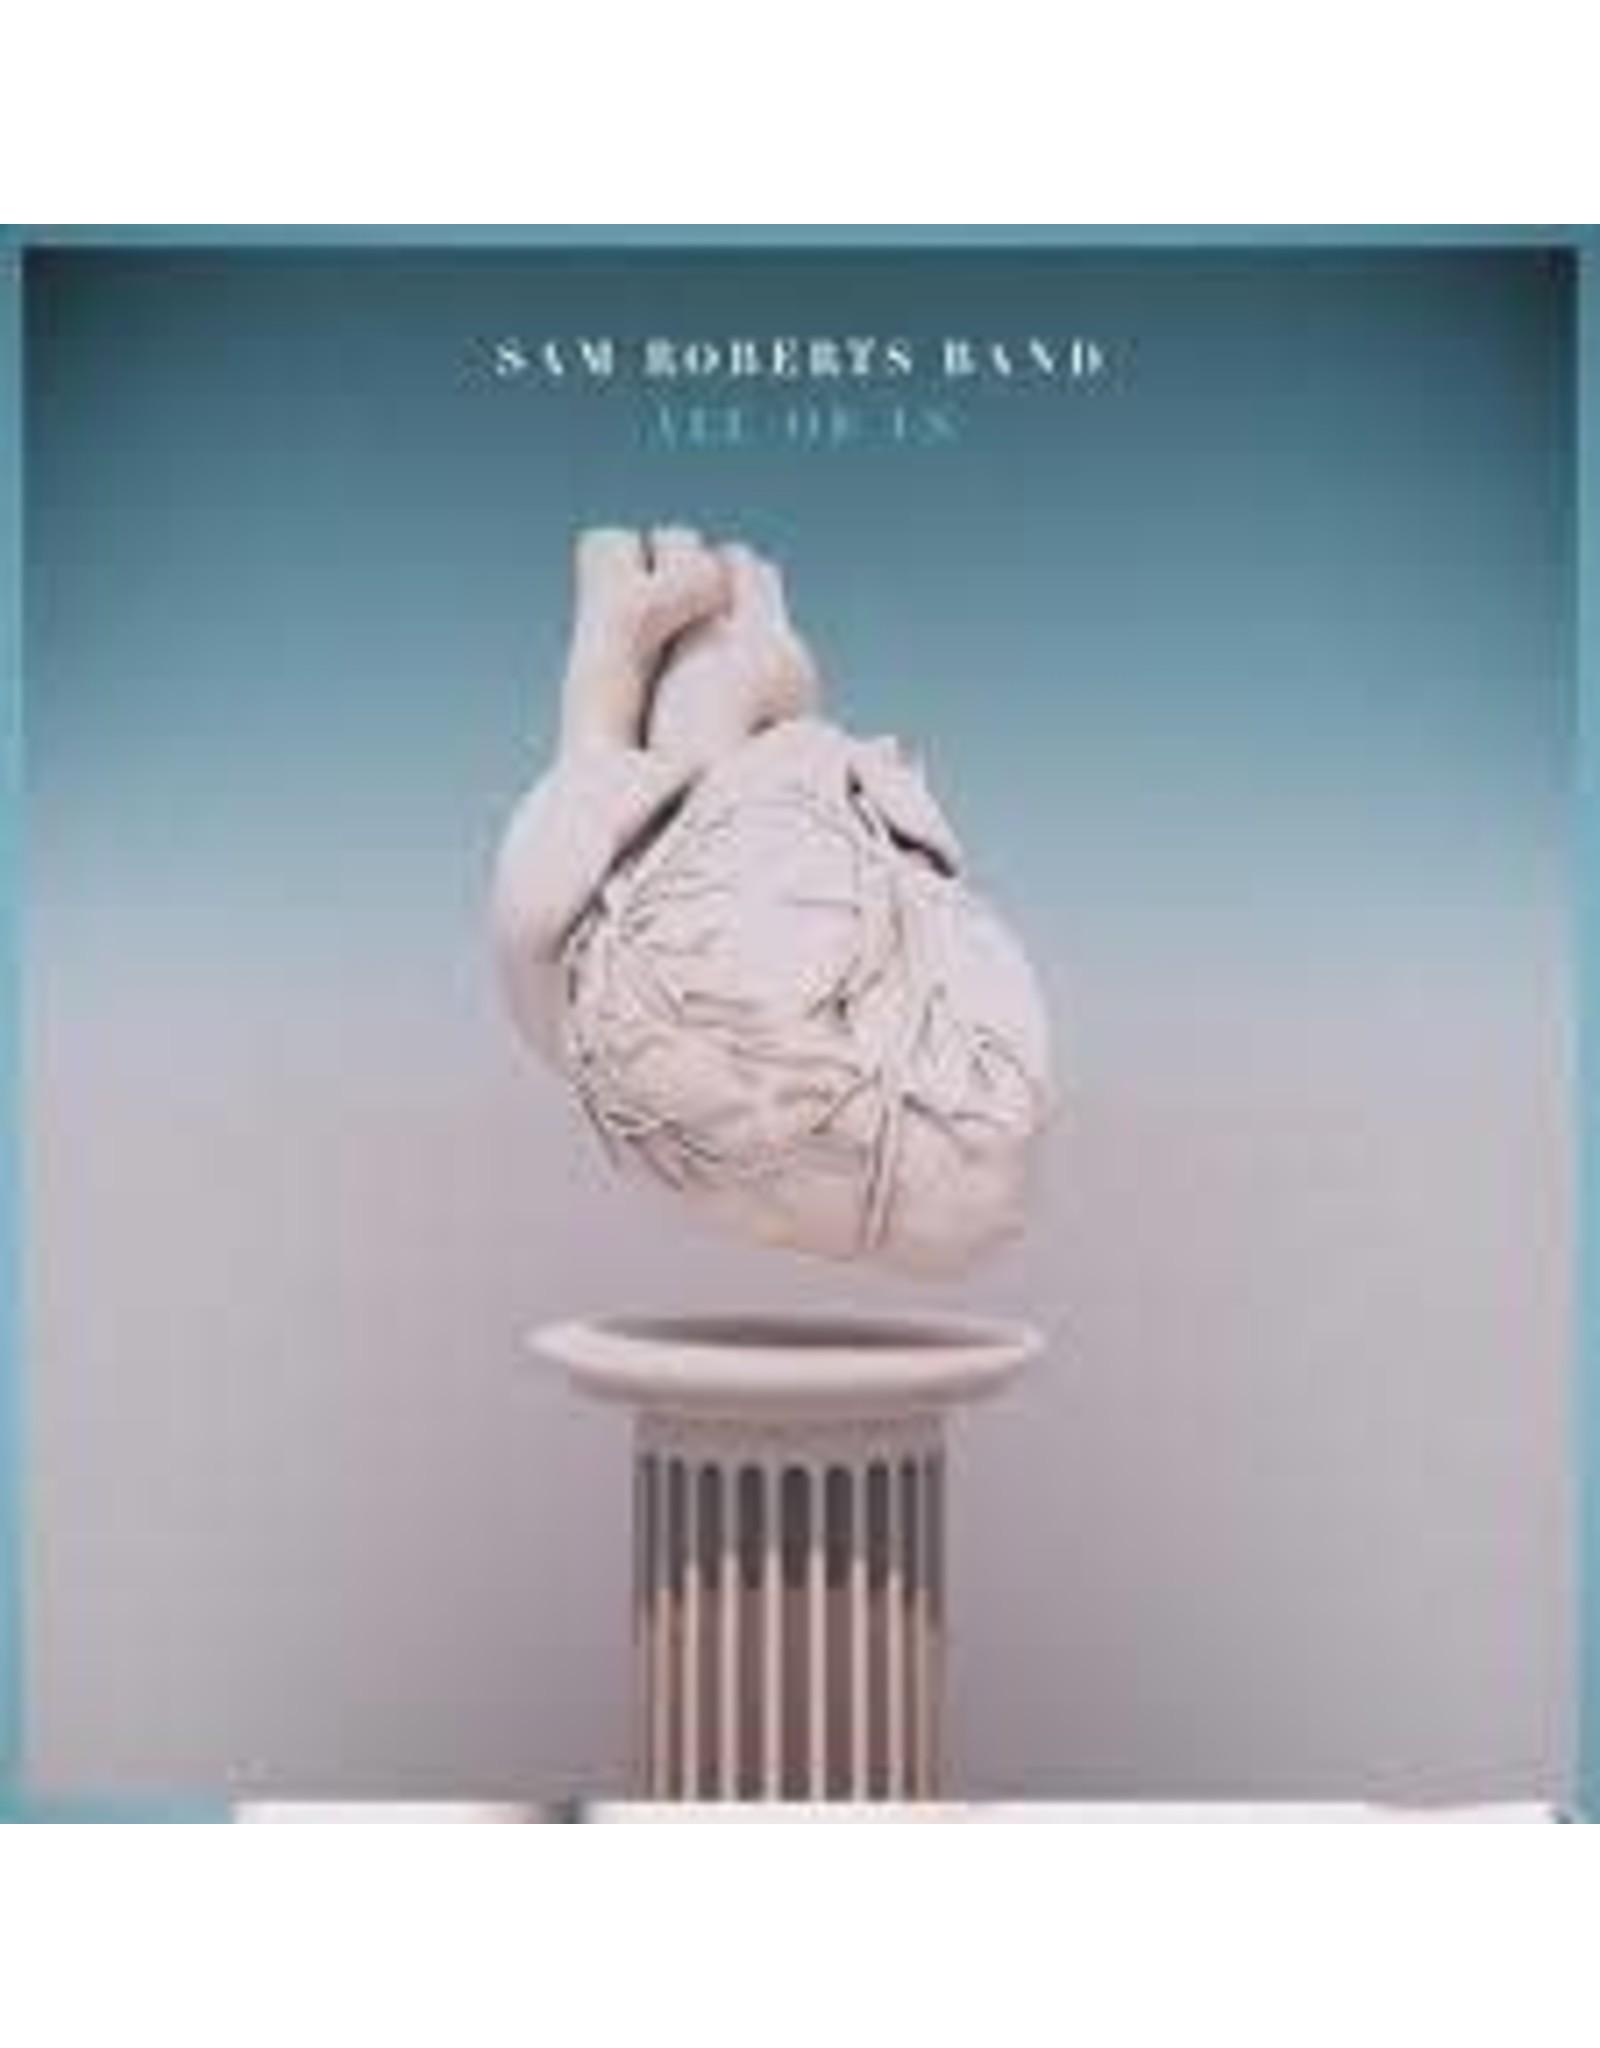 Roberts, Sam - All of Us LP